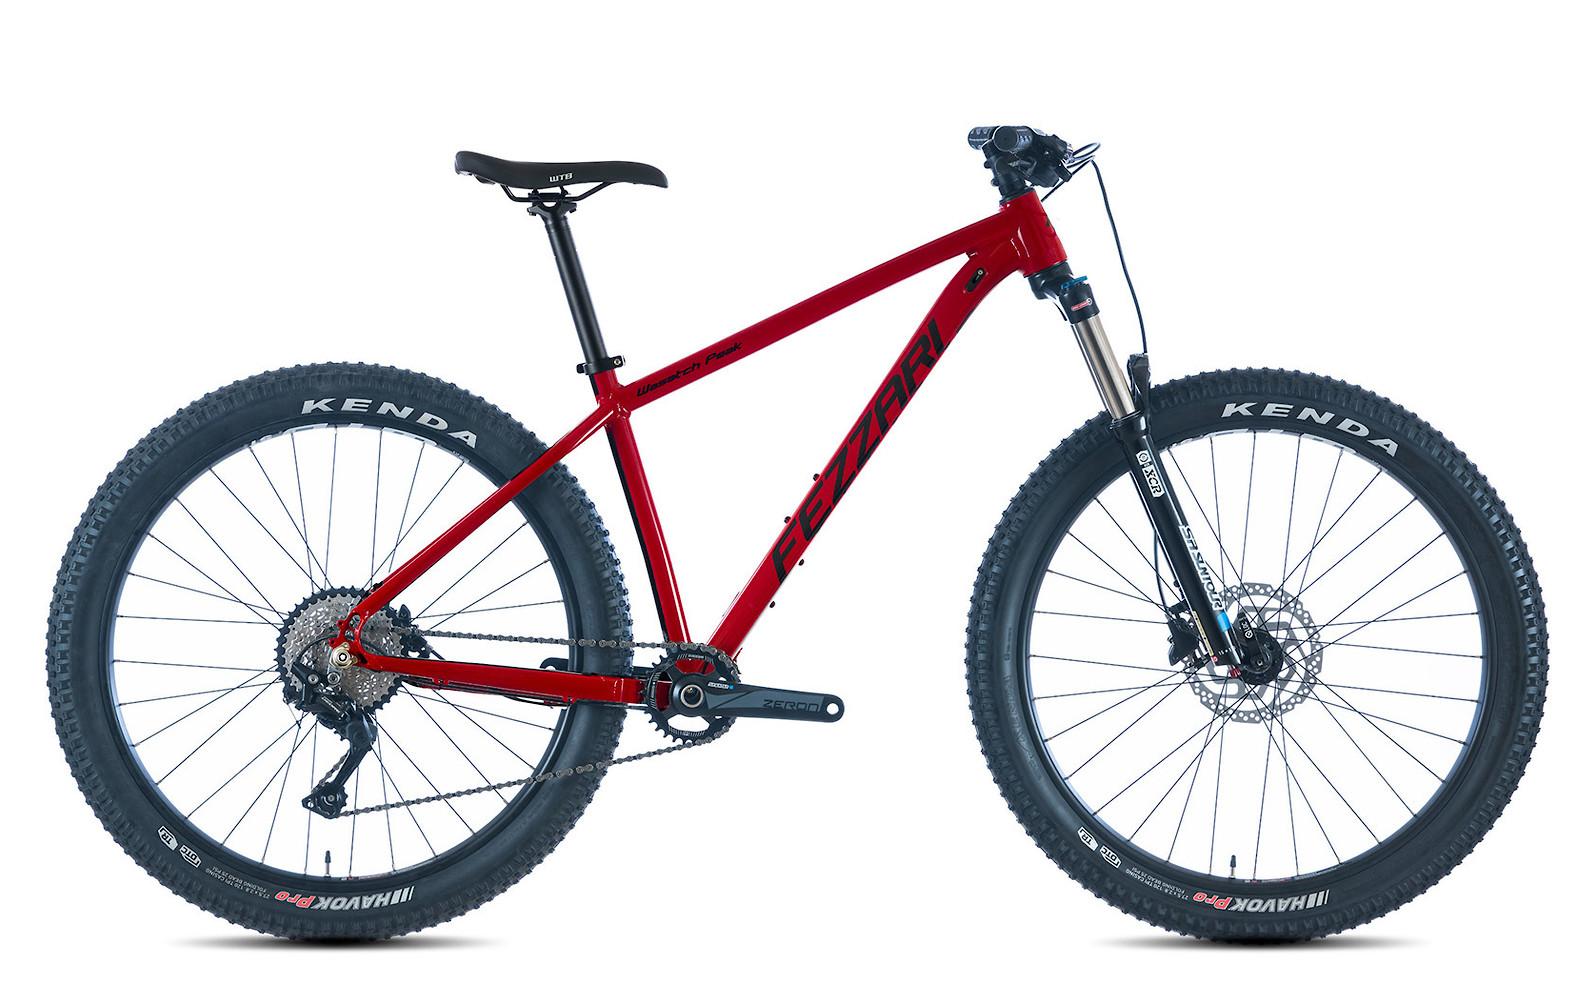 2019 Fezzari Wasatch Peak Comp 27.5 Plus Bike